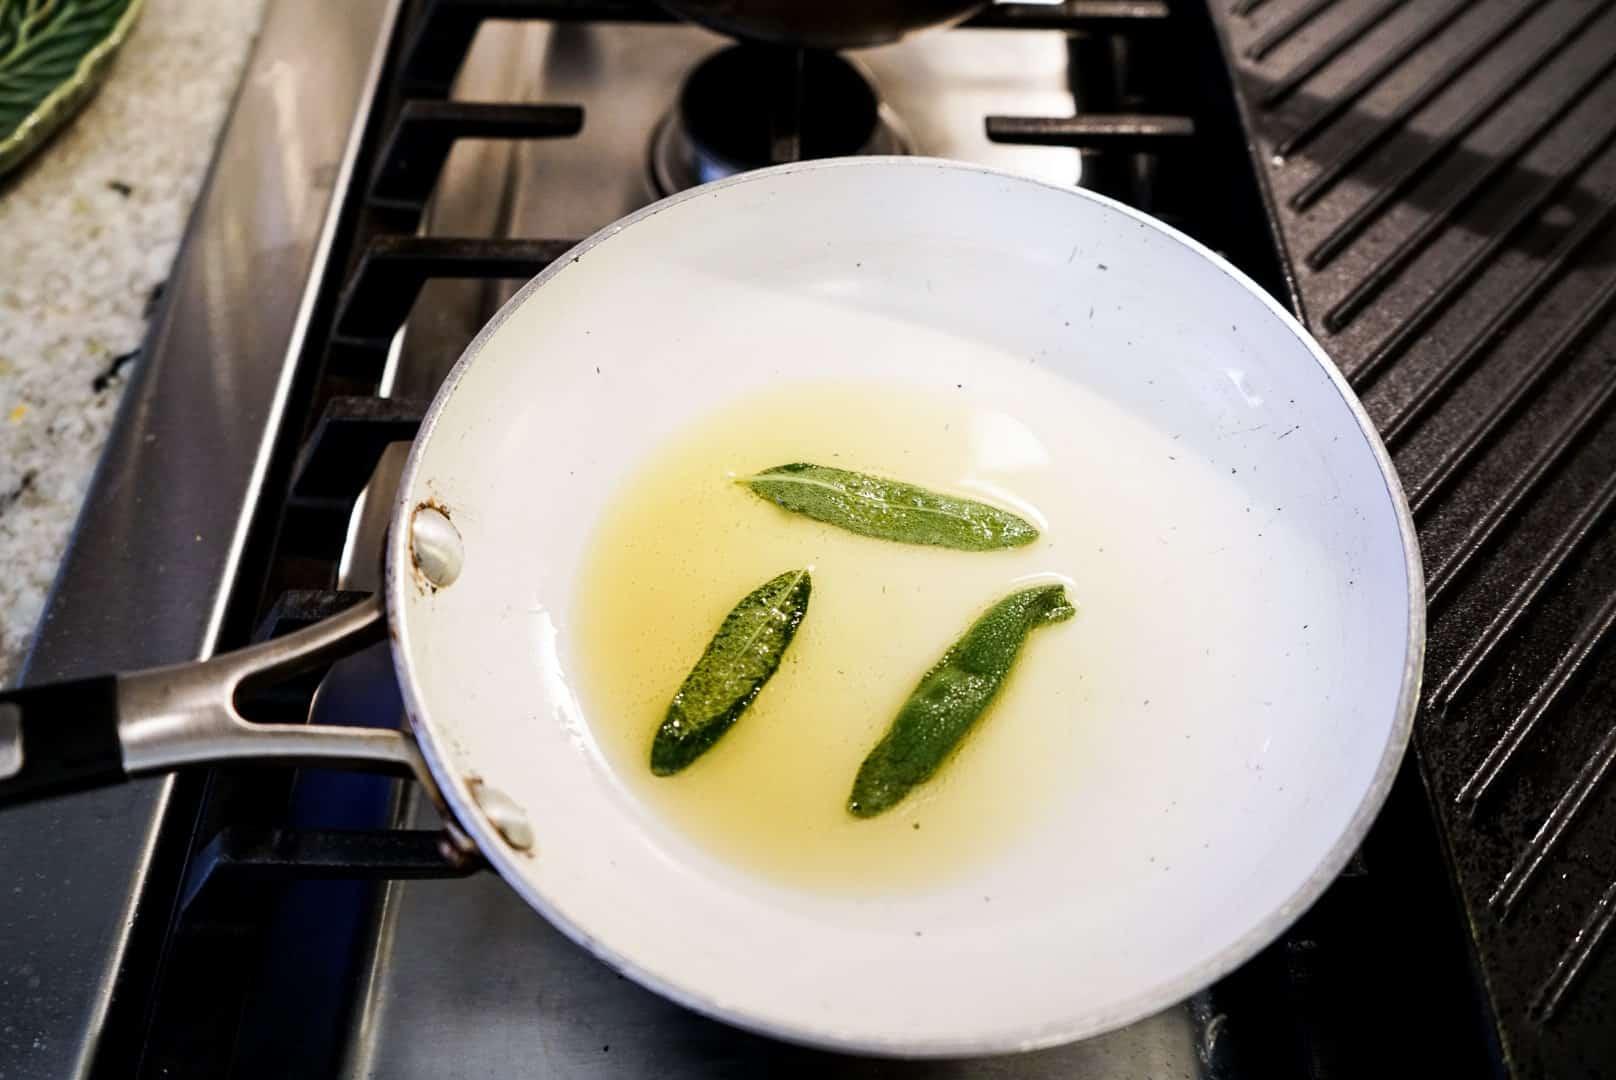 frying sage in frying pan